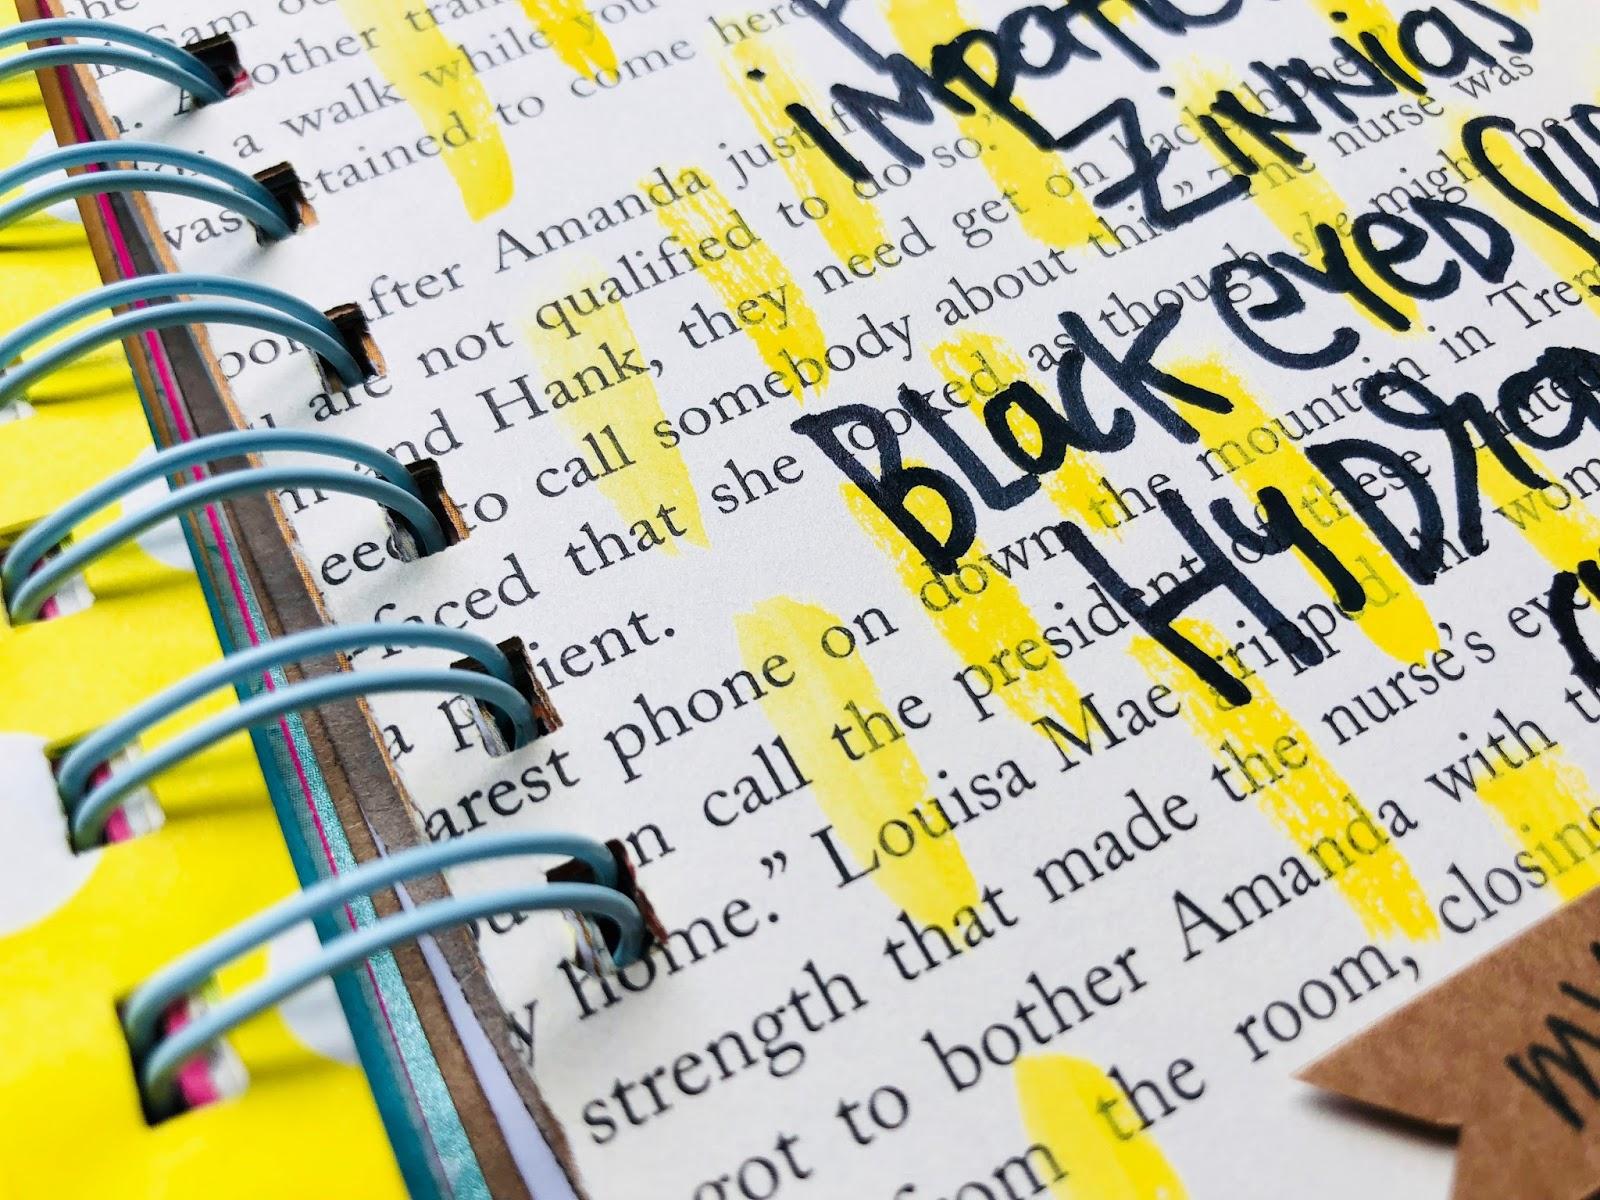 #30lists #listmaker #list challenge #mini book #scrapbooking #smashbook #favorite plants